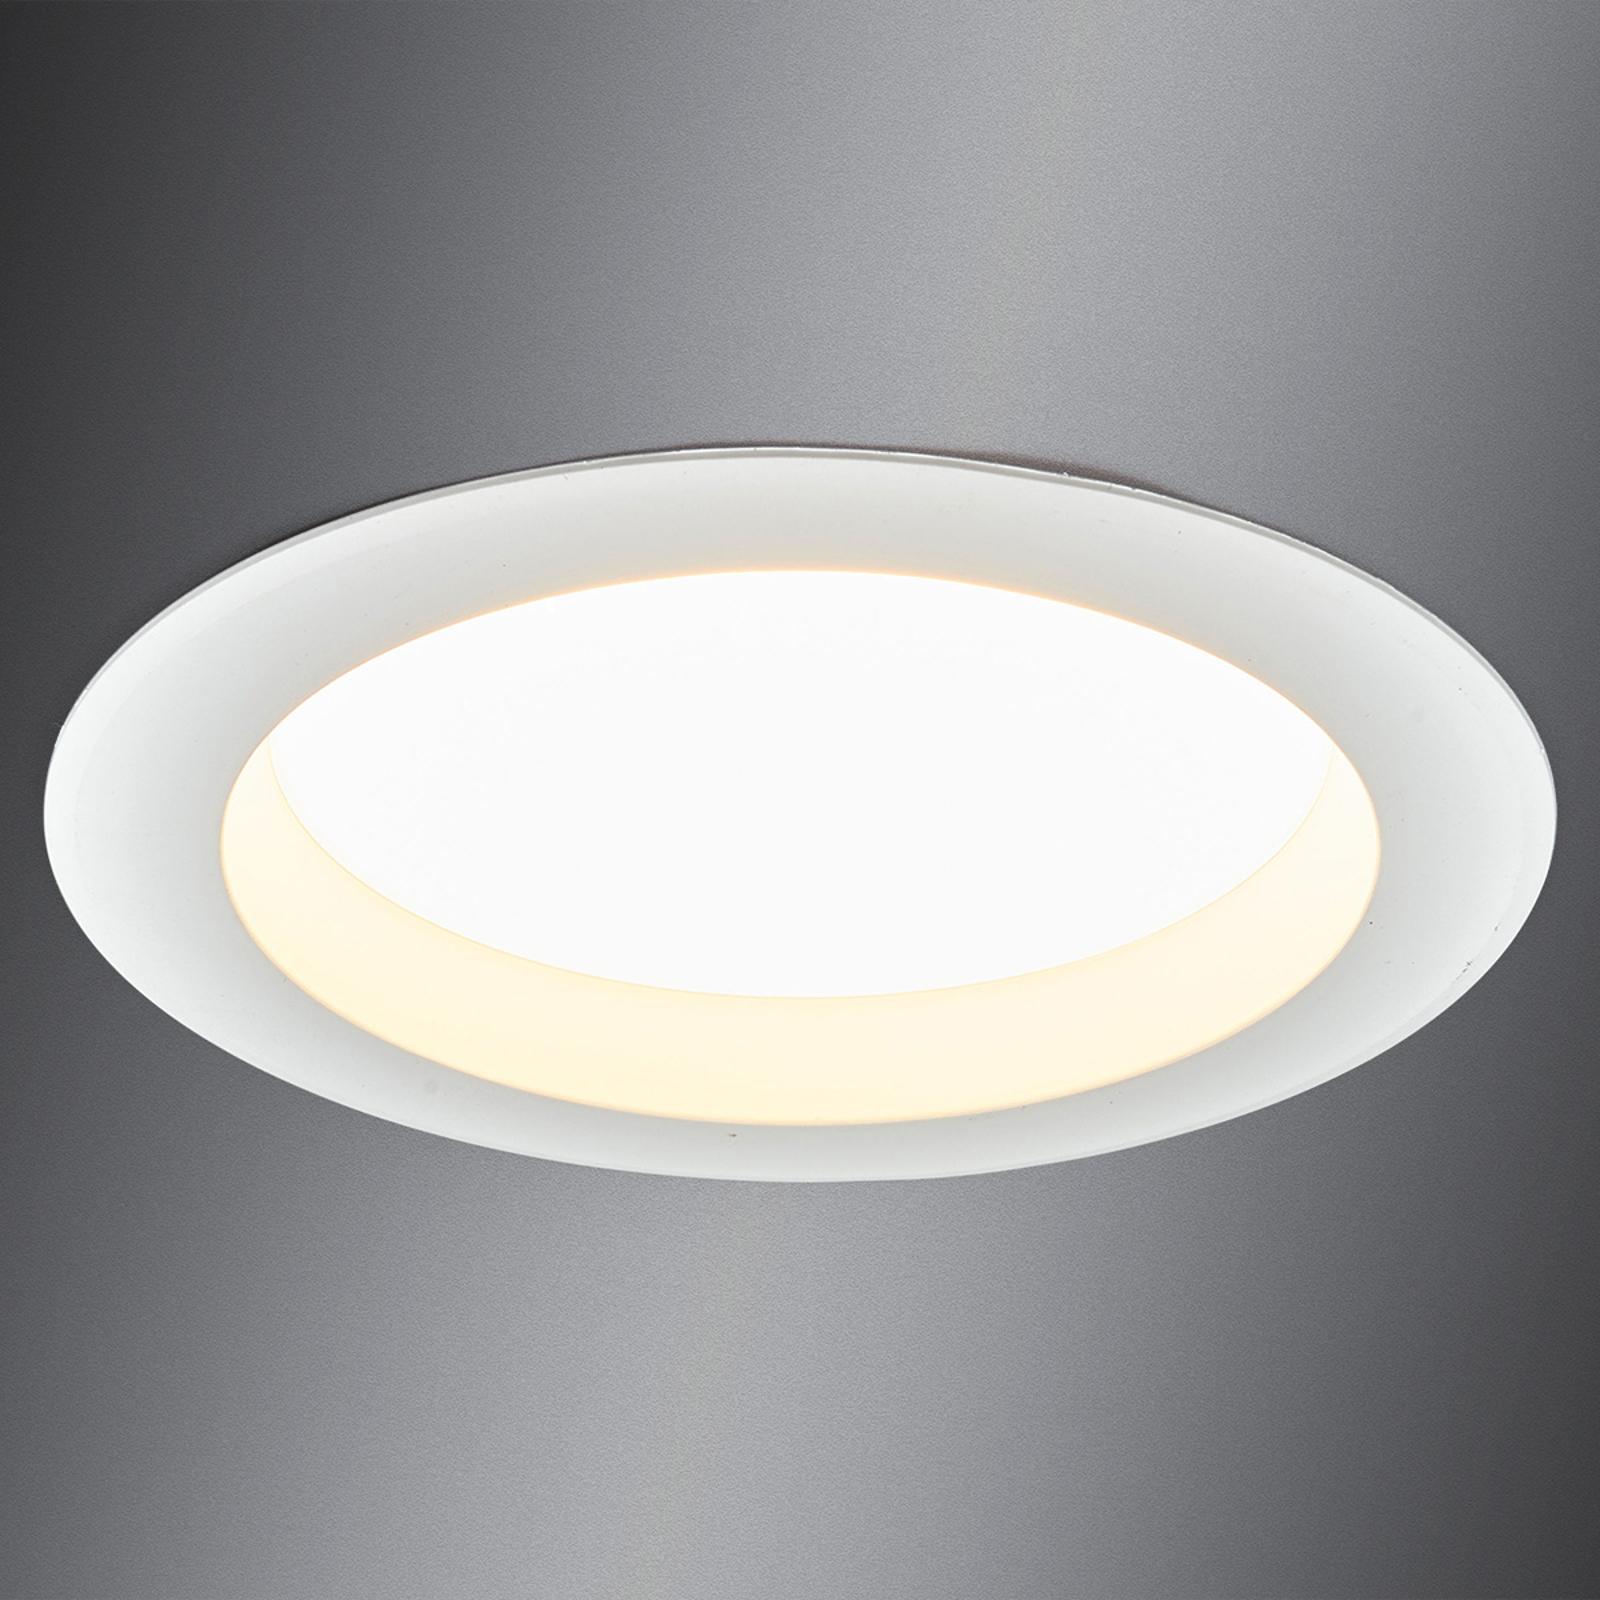 LED svítidlo downlight Arian 17,4 cm 15 W